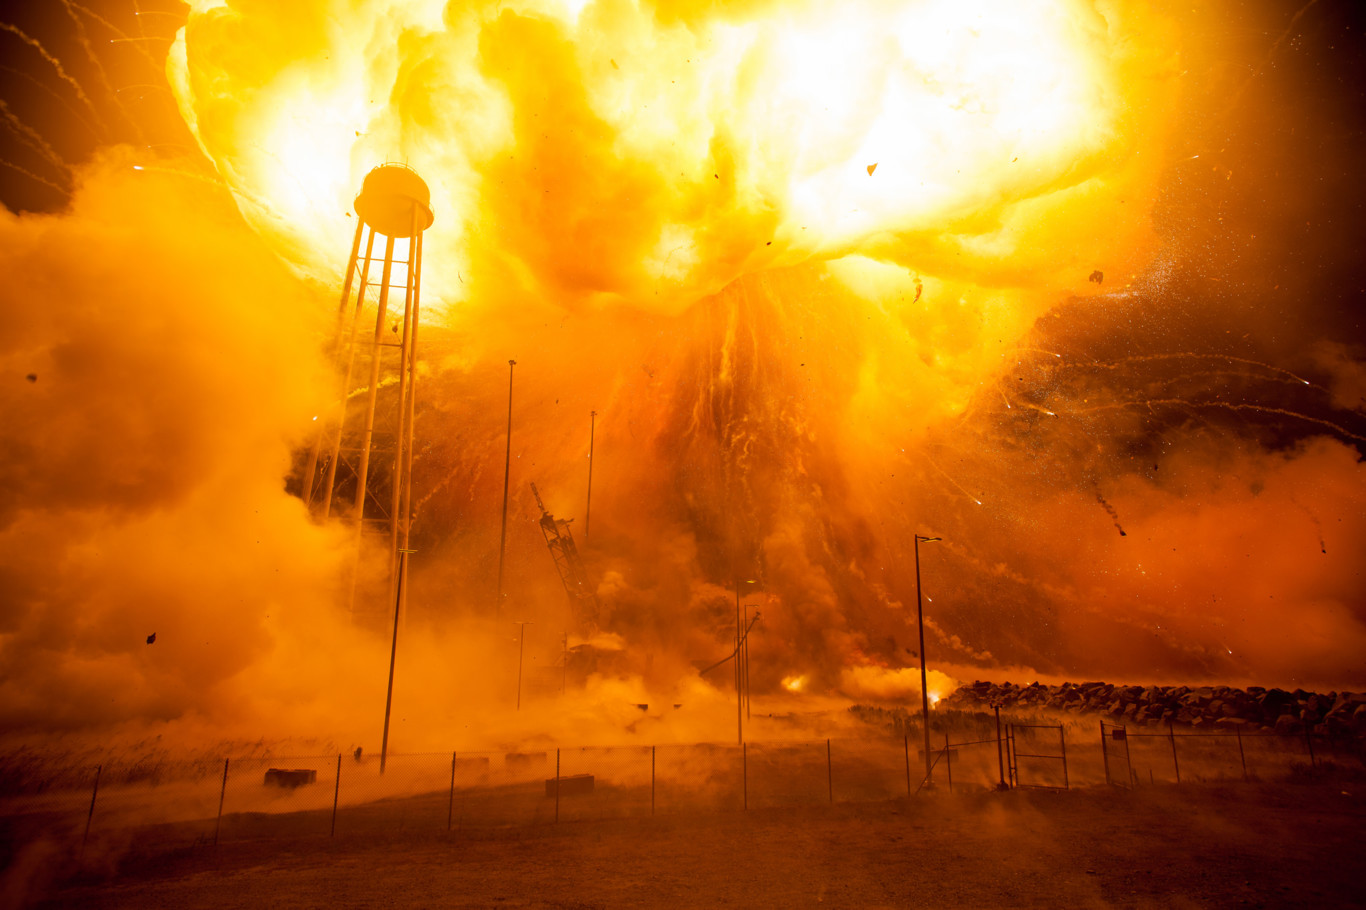 explosion Nasa 8